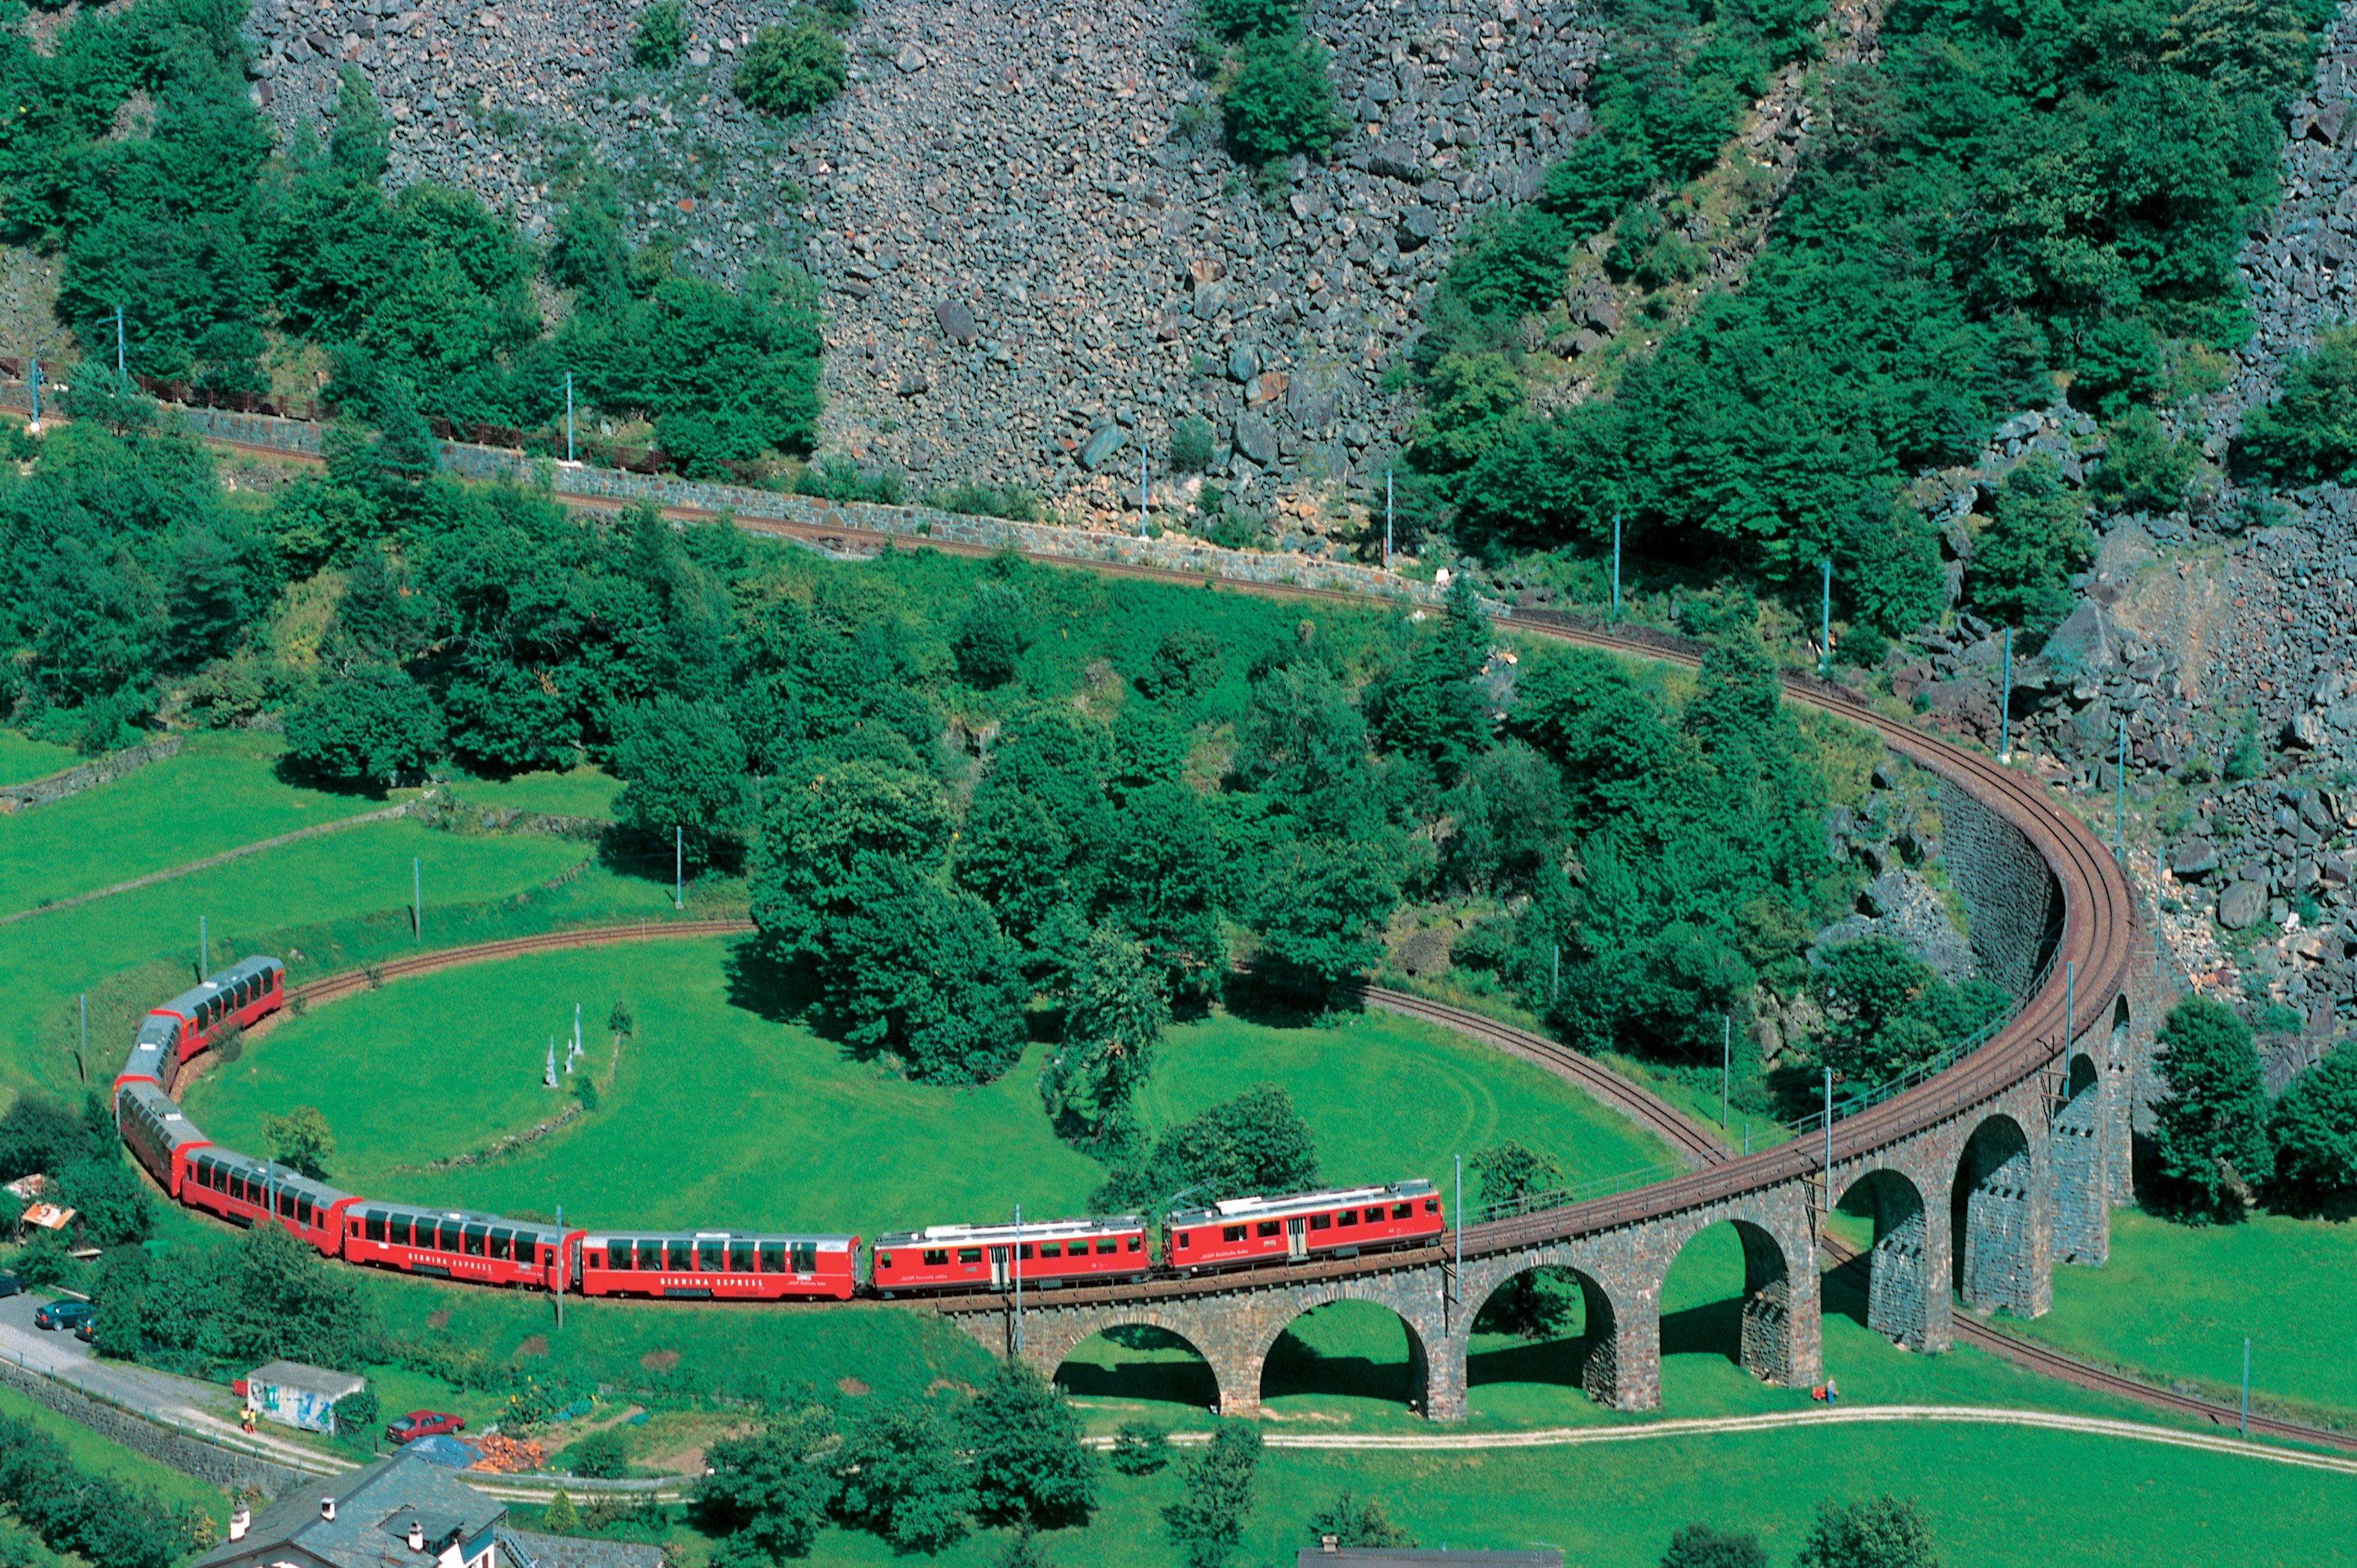 25 Viajes En Tren Que Debes Hacer Alguna Vez En Tu Vida